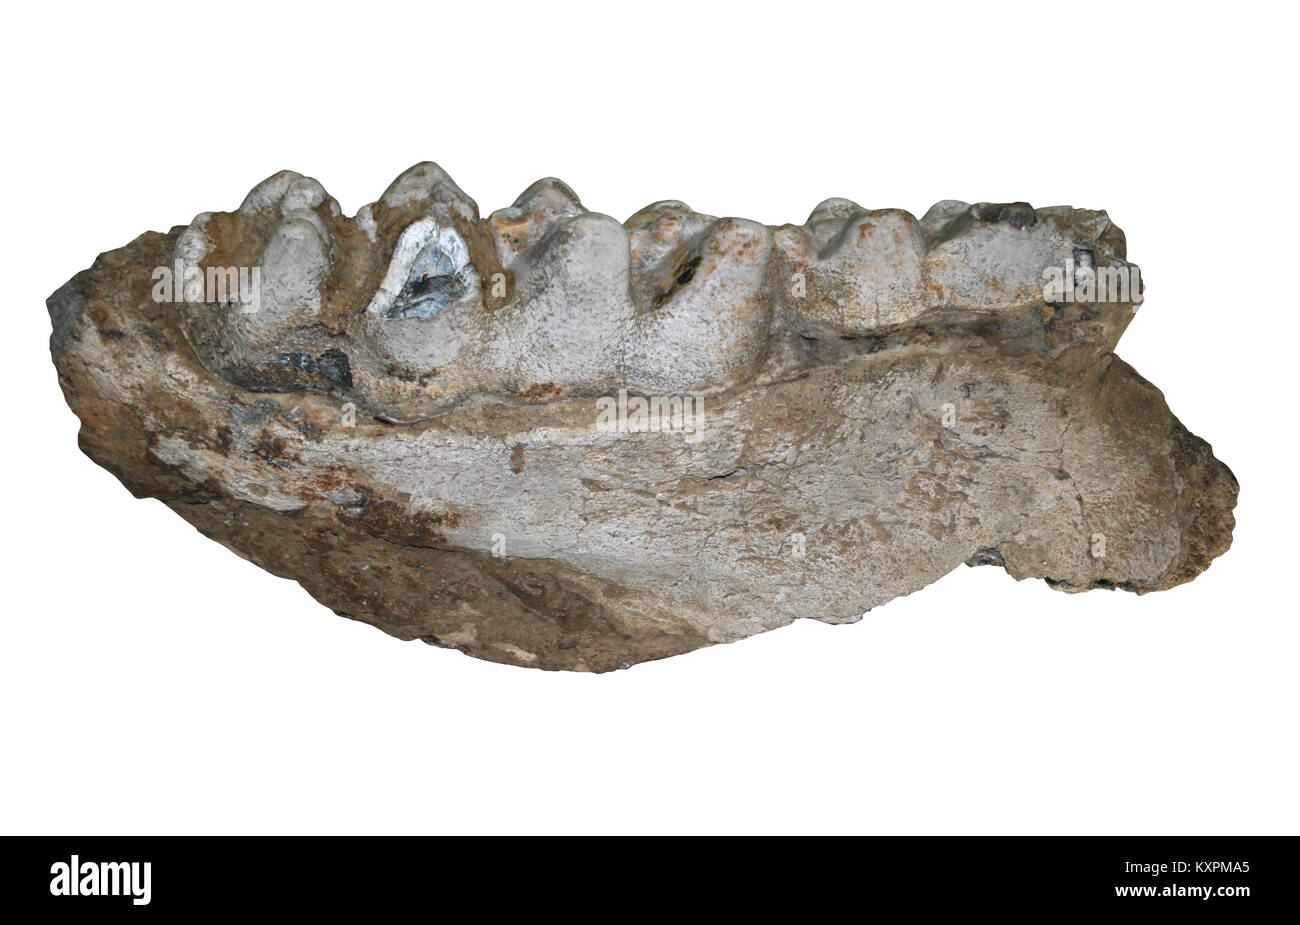 Mandibular And Teeth Of The Extinct Gomphothere Cuvieronius hyodon Relative Of Modern Day Elephants - Stock Image